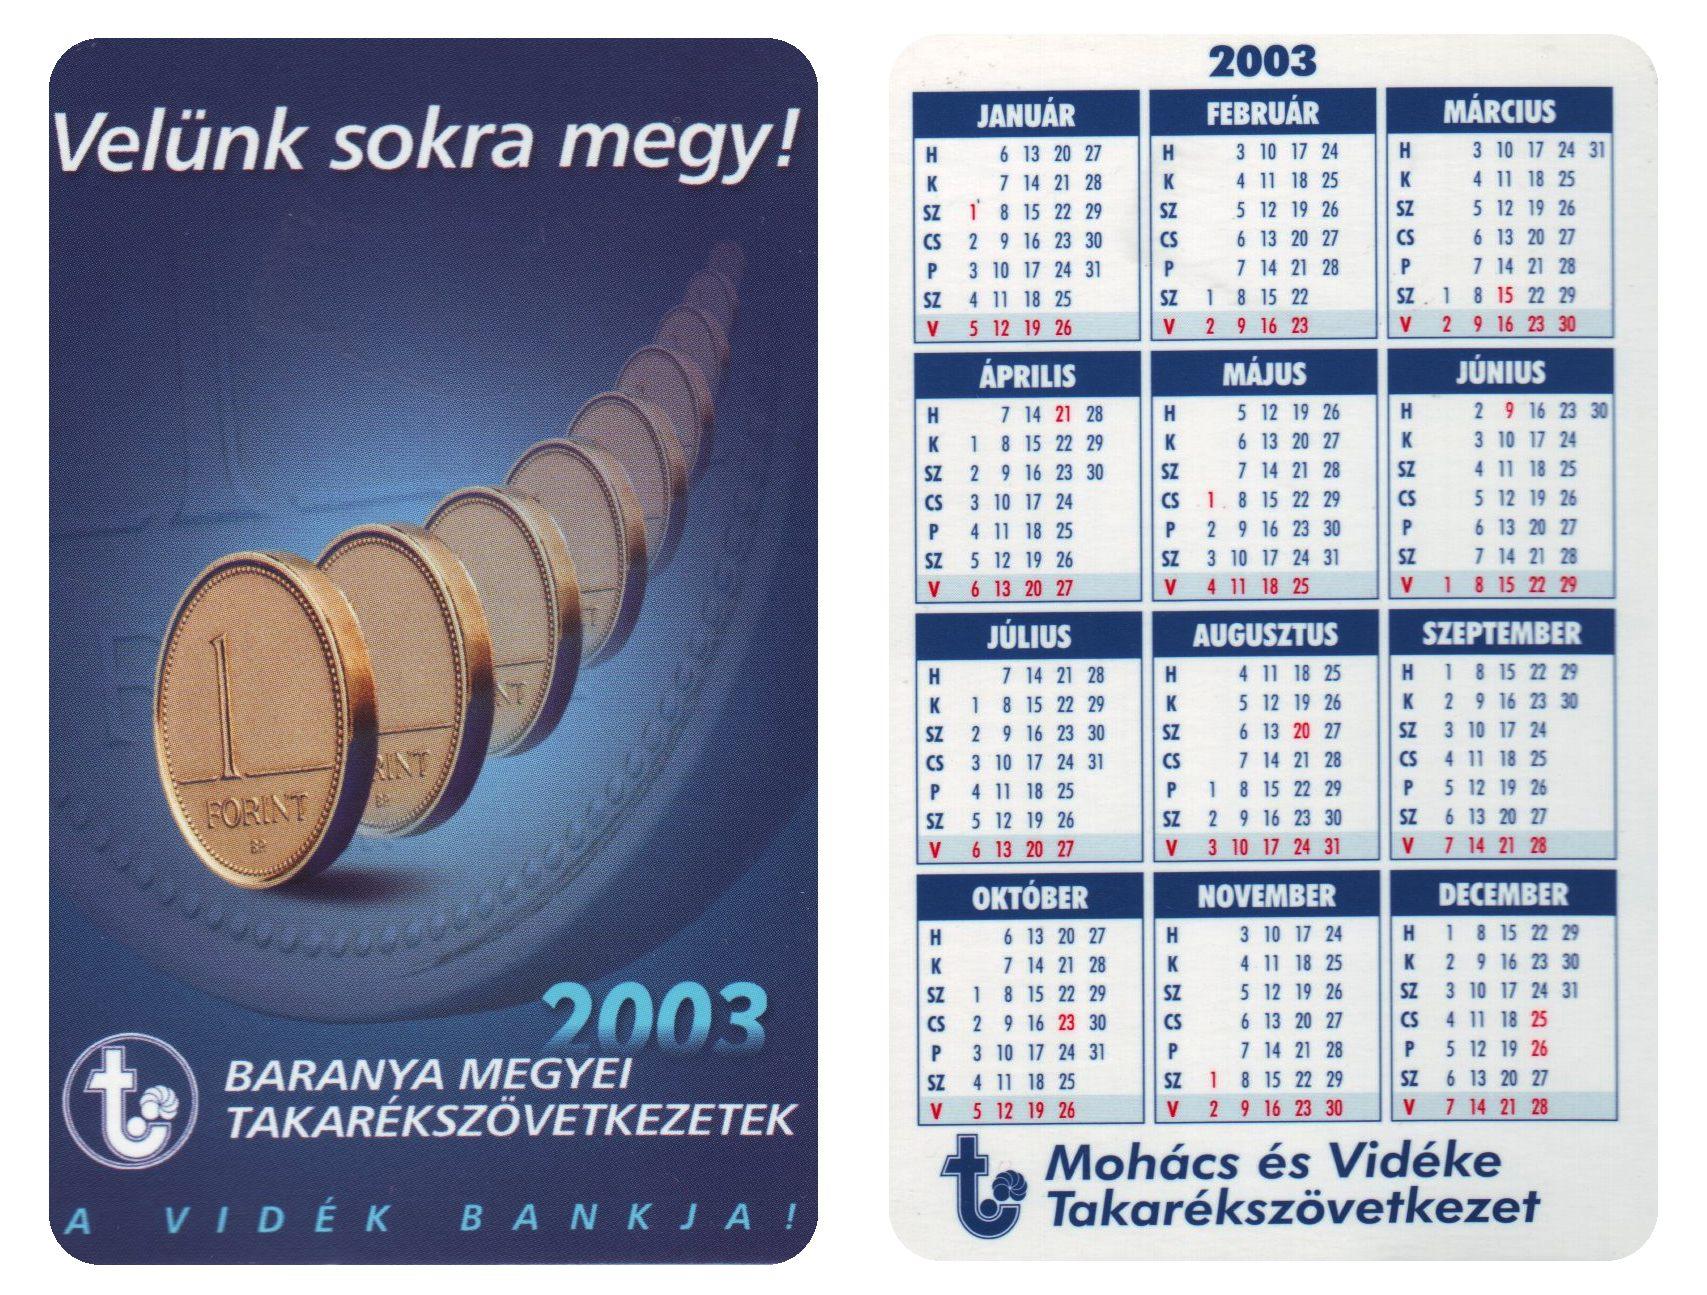 http://www.forintportal.hu/kartyanaptar/www_forintportal_hu_2003_kartyanaptar_034_nagy.jpg